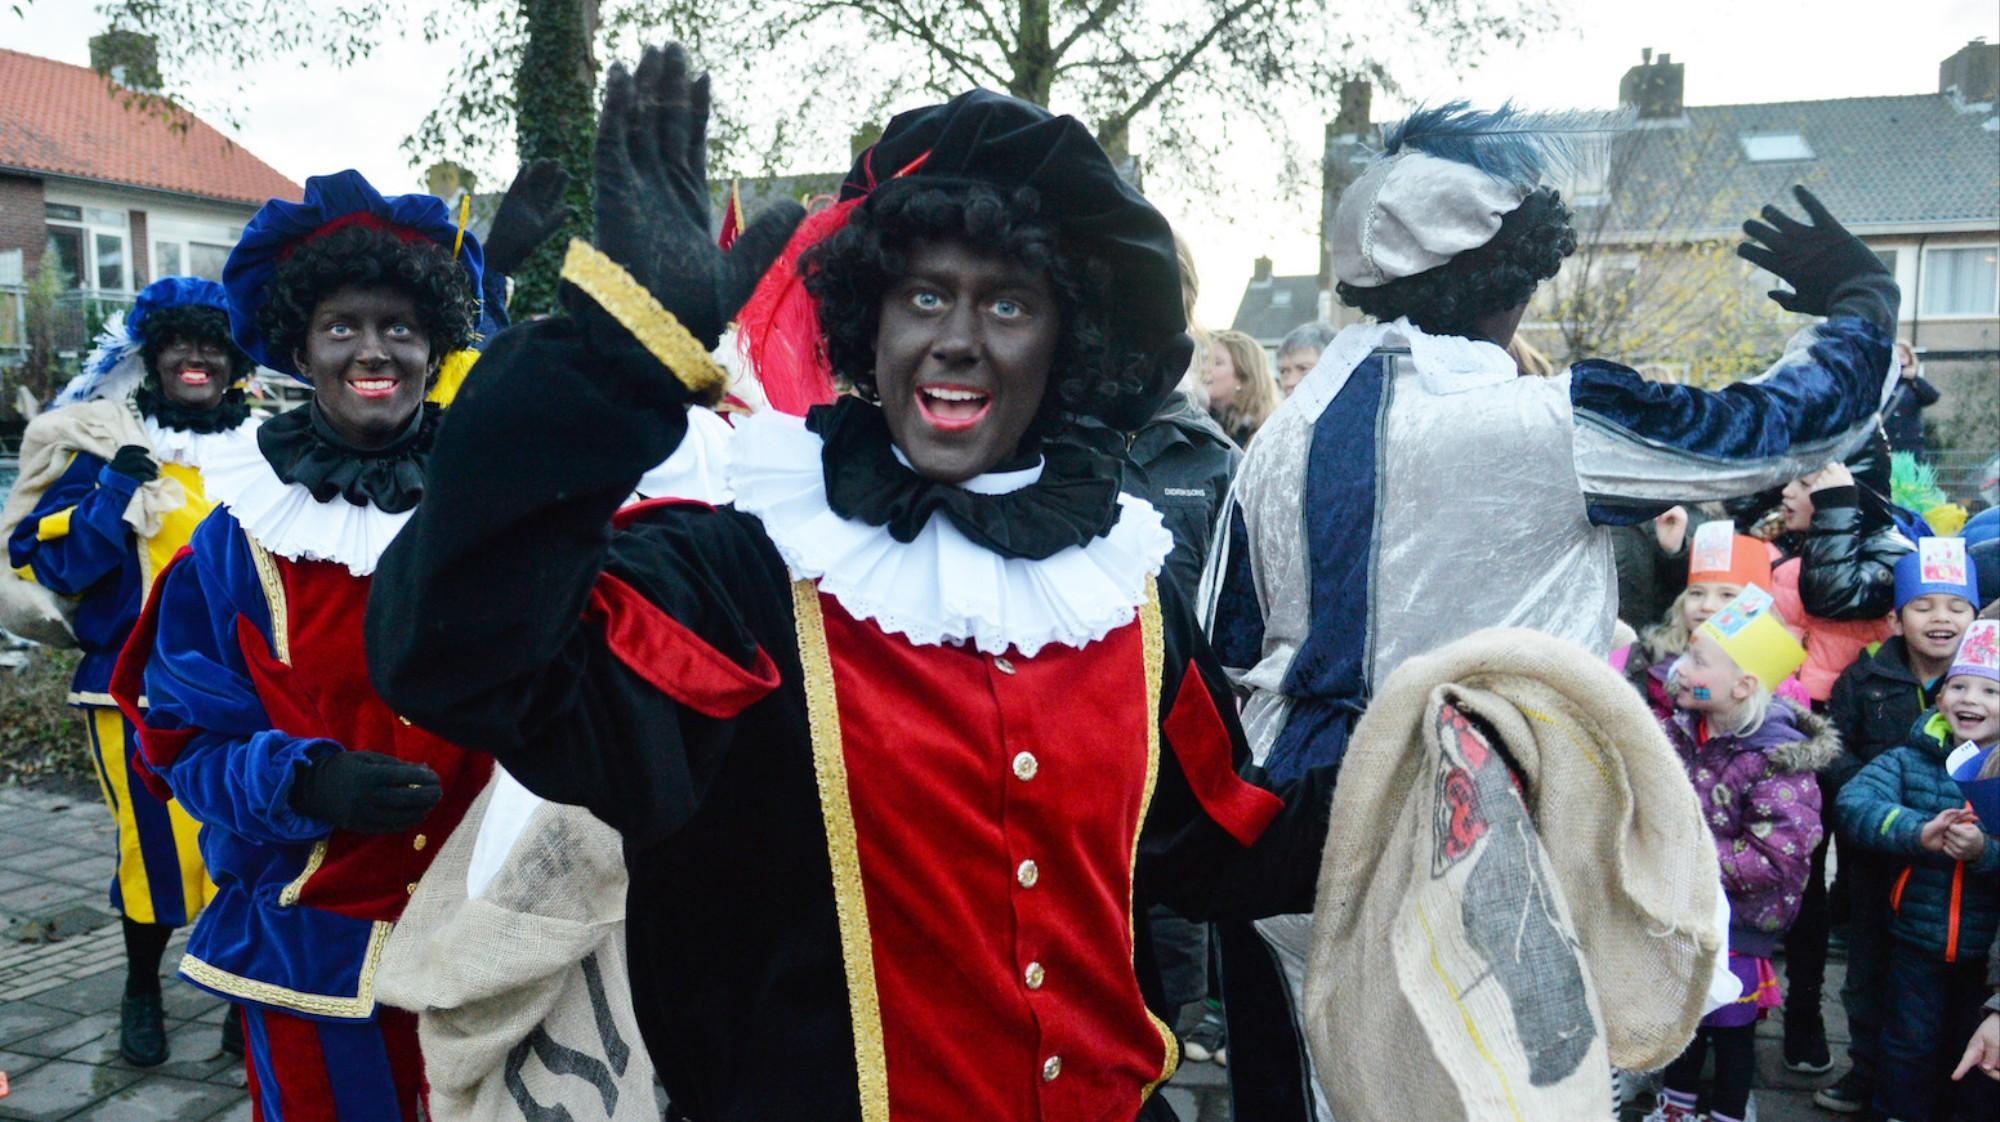 Dutch Christmas.A Dutch Broadcaster Dropped A Blackface Christmas Character